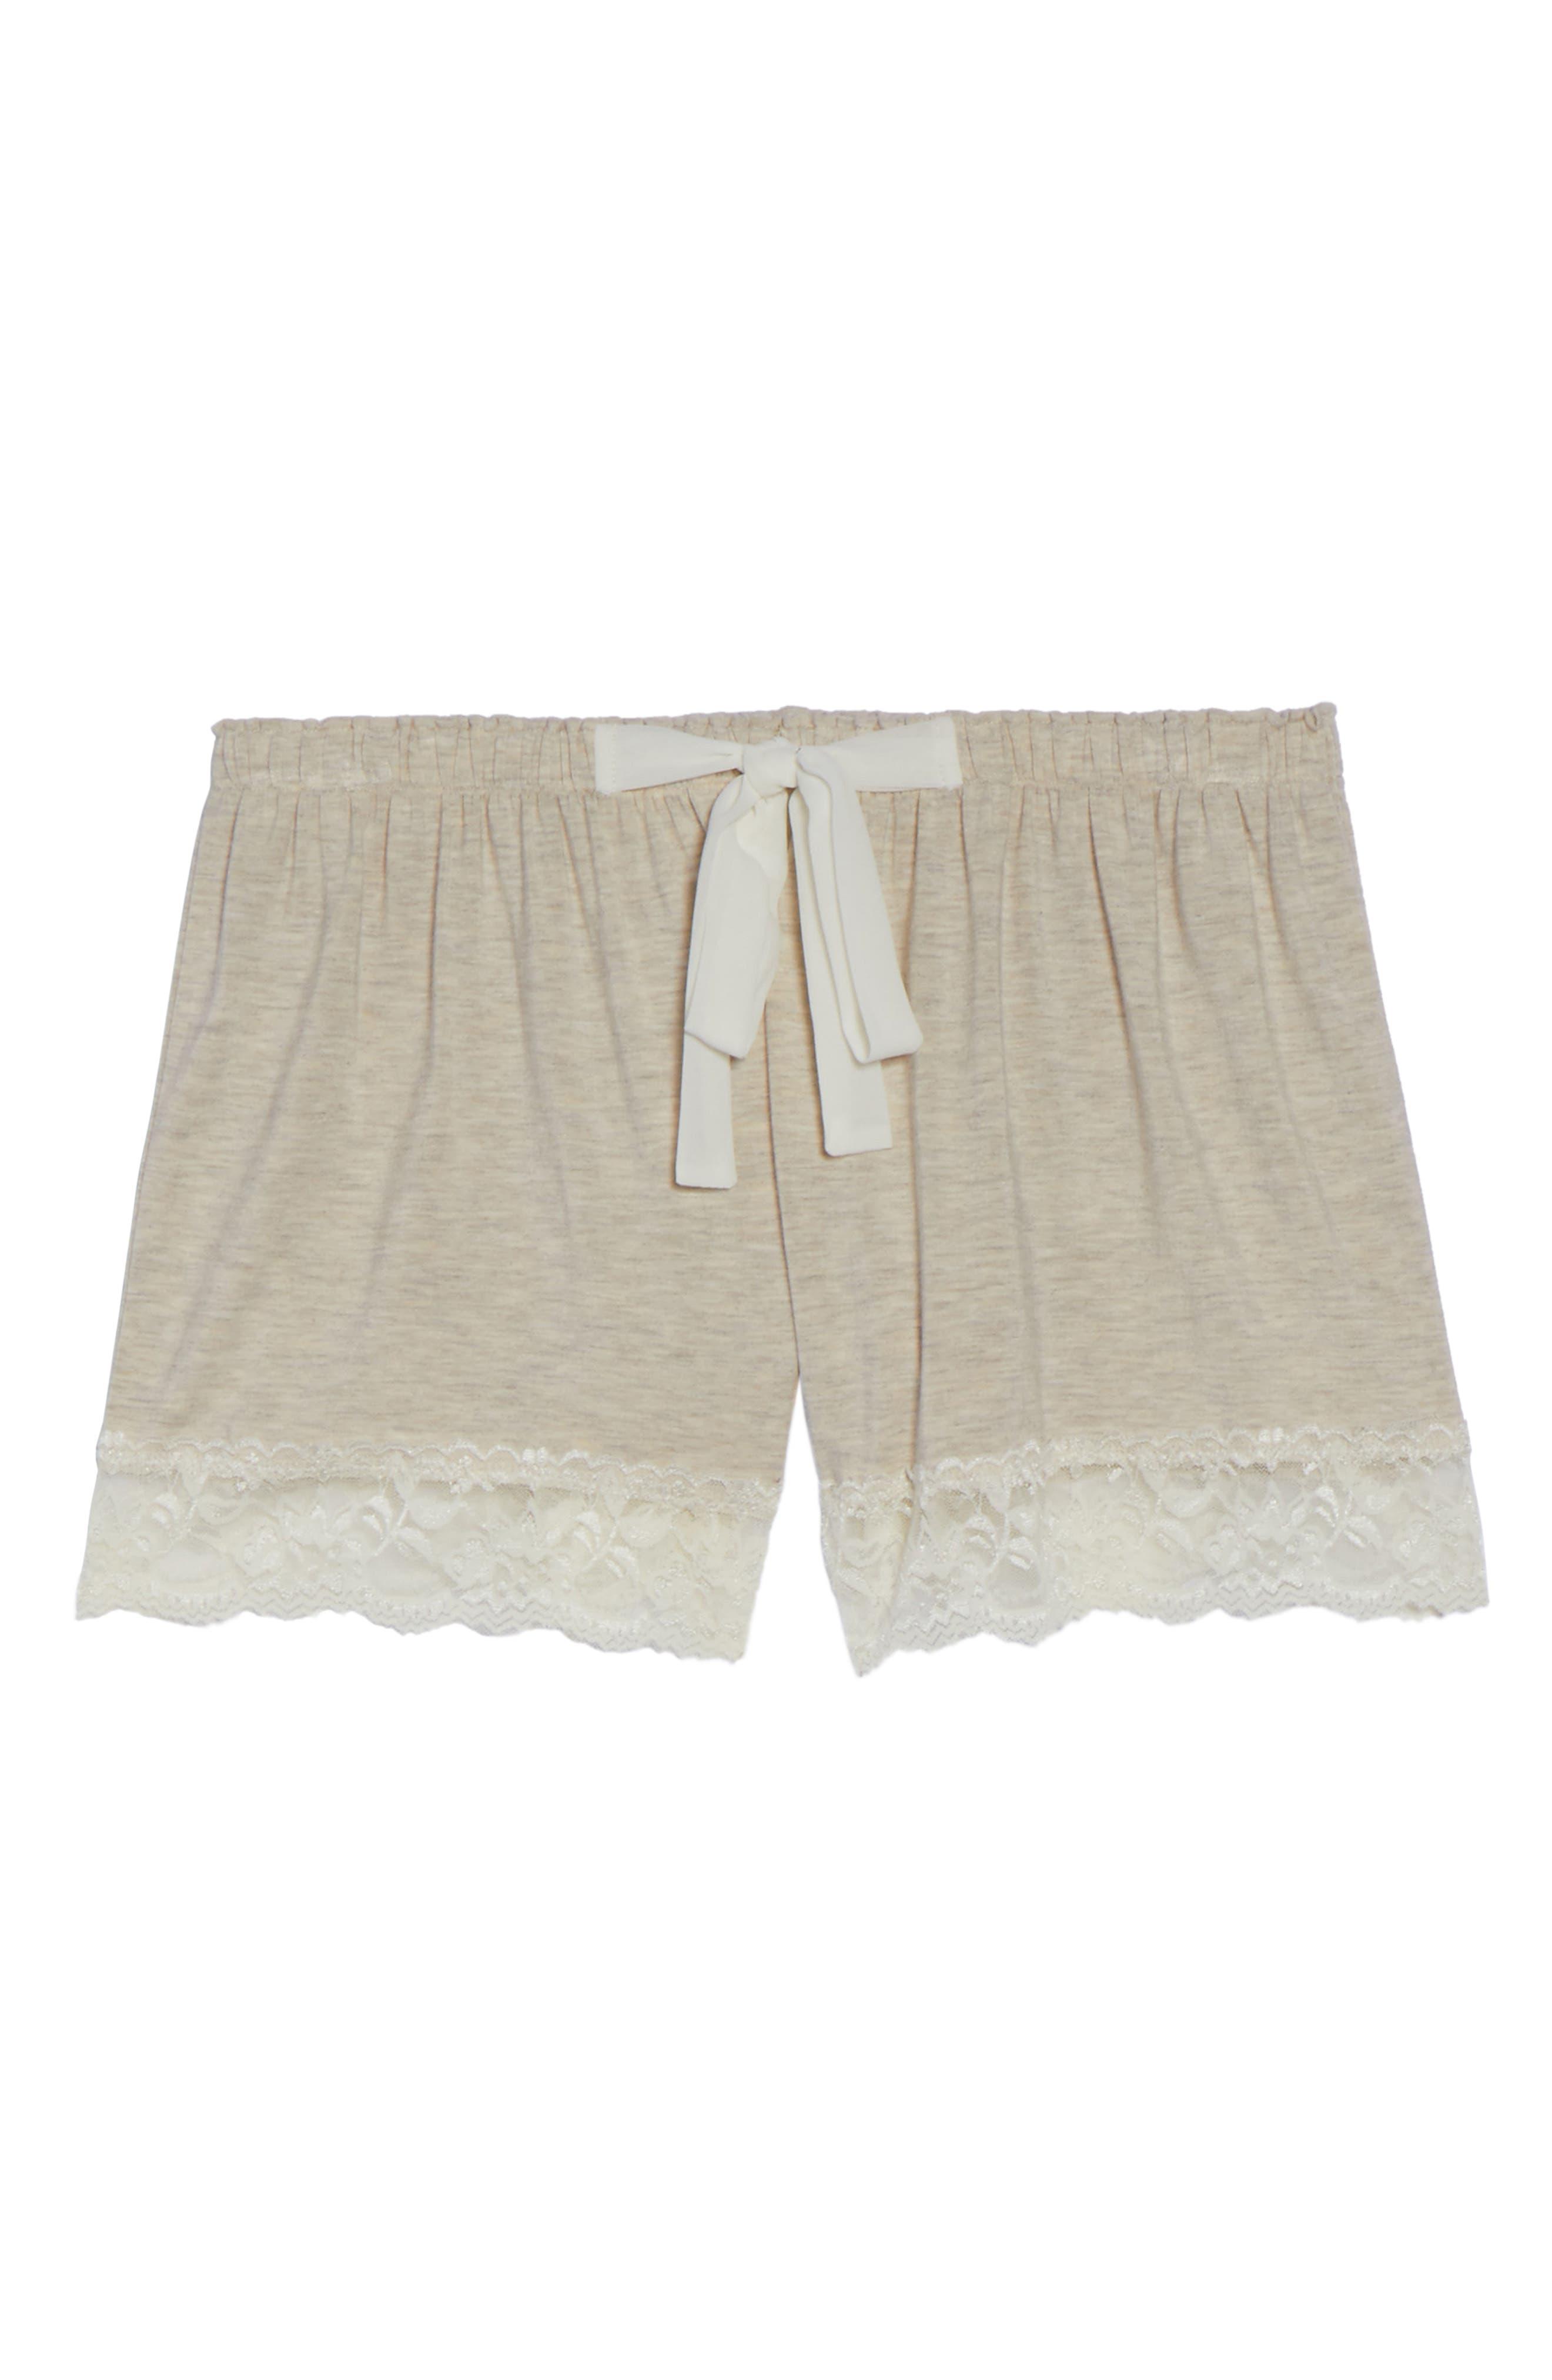 Flora Nikrooz Snuggle Lounge Shorts,                             Alternate thumbnail 8, color,                             Oatmeal